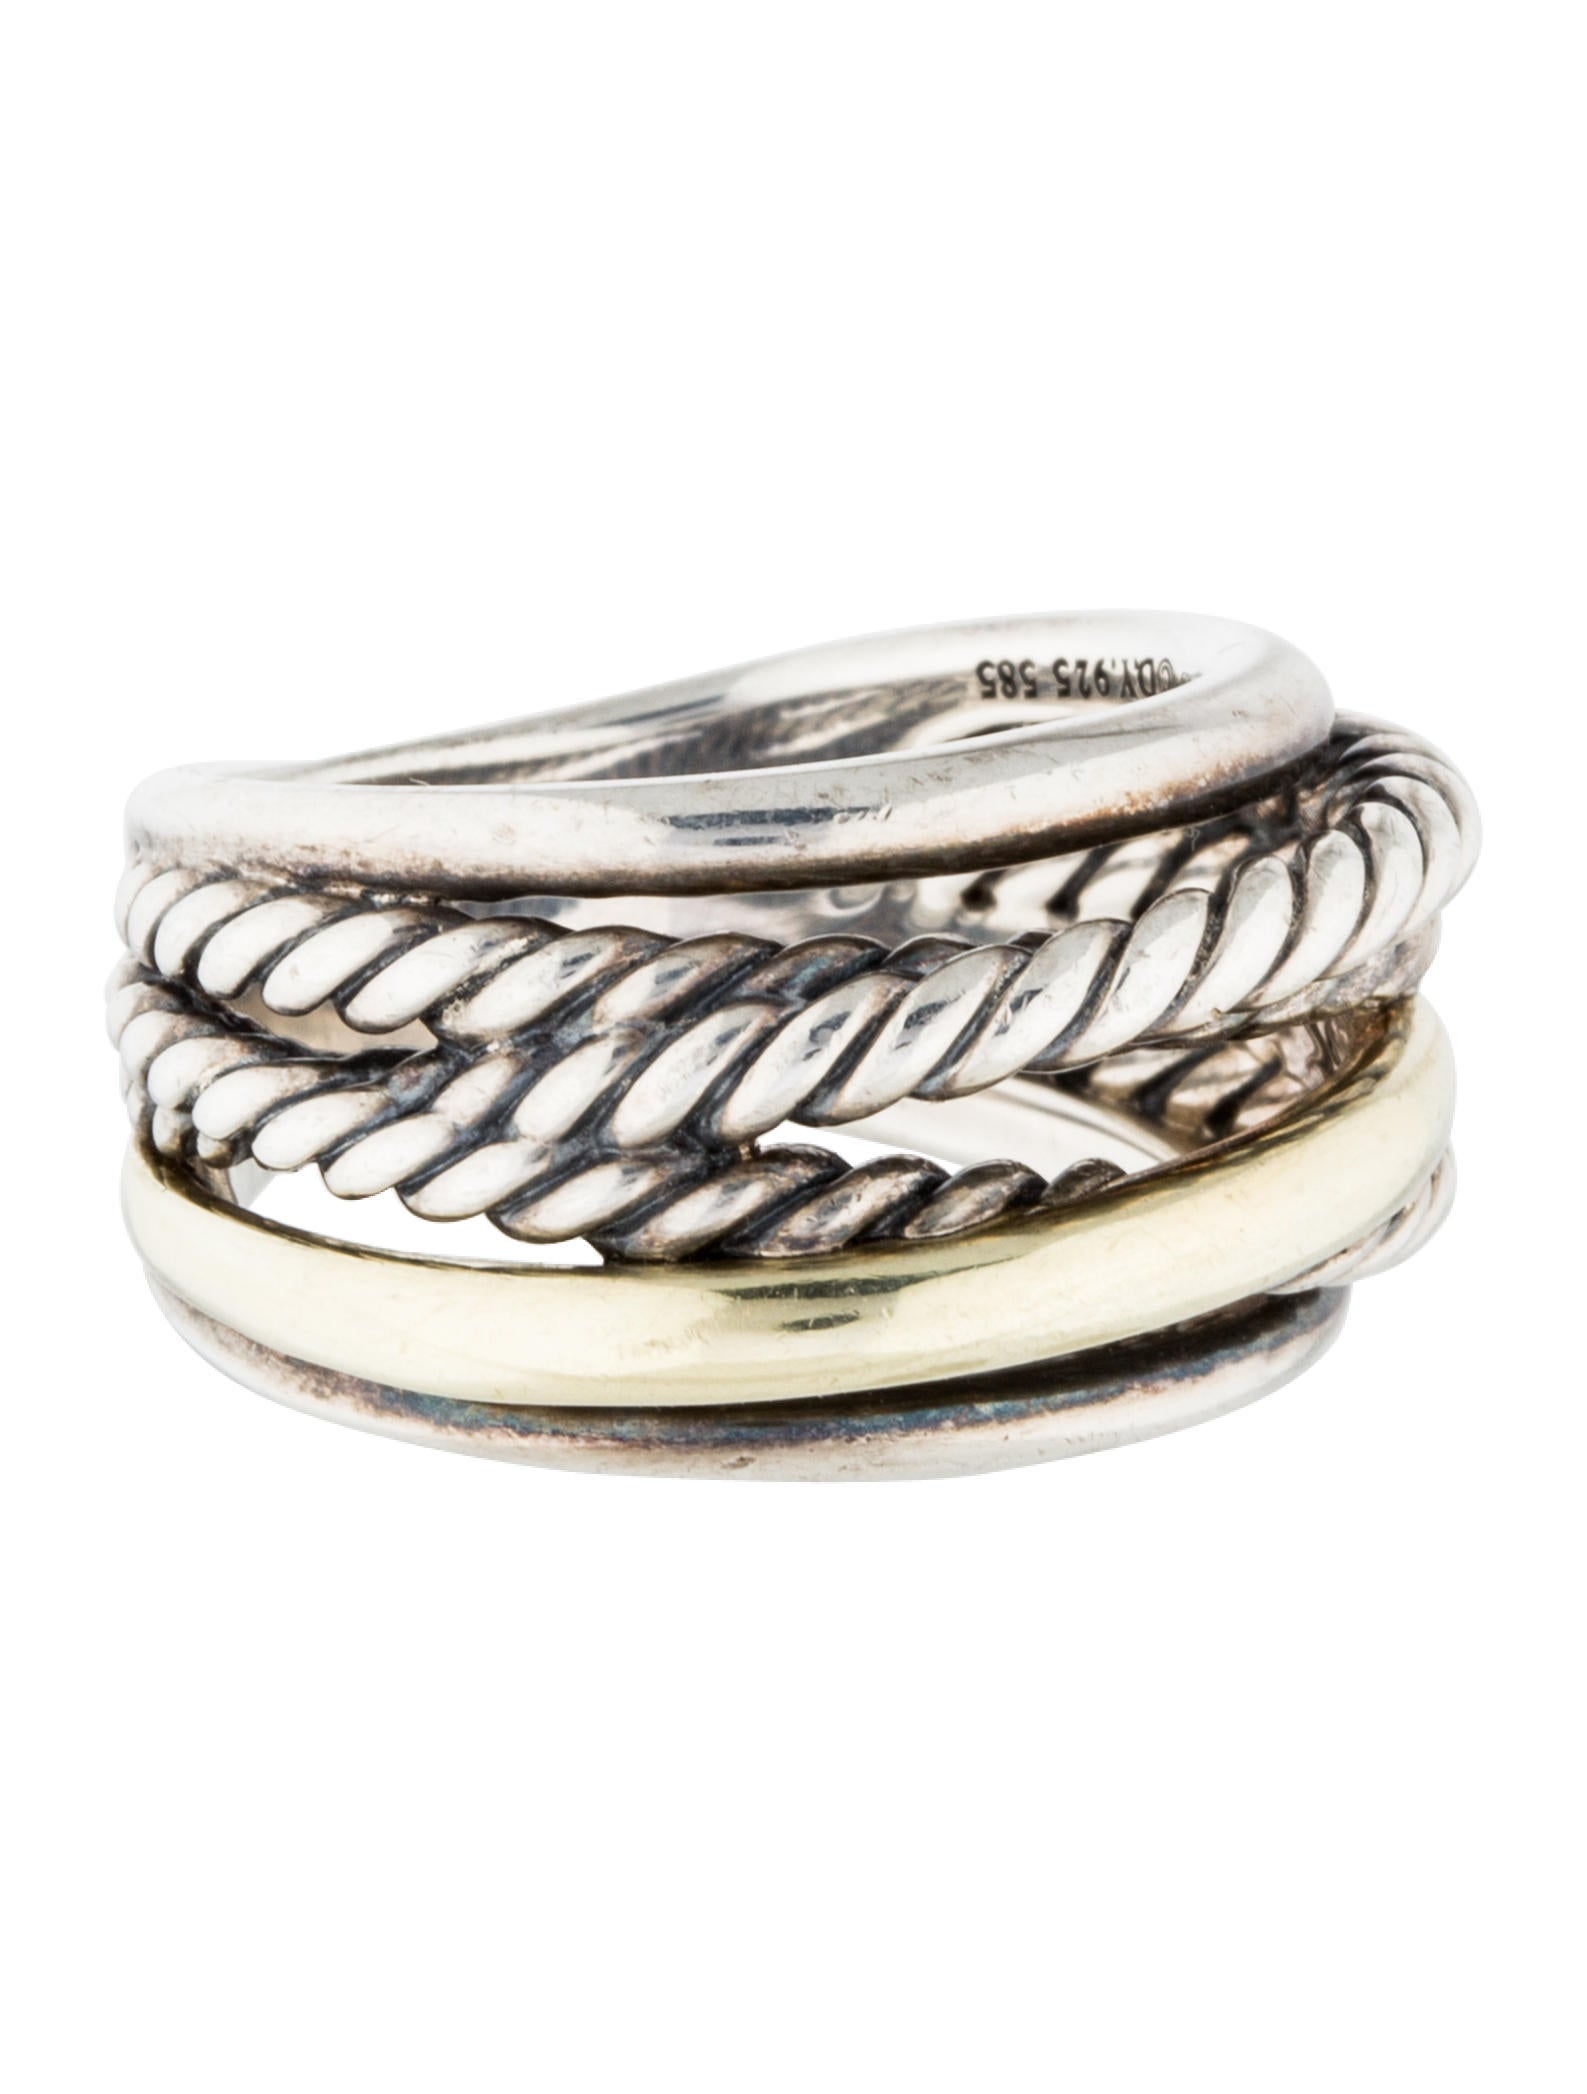 David yurman crossover narrow ring rings dvy37670 for David yurman inspired jewelry rings